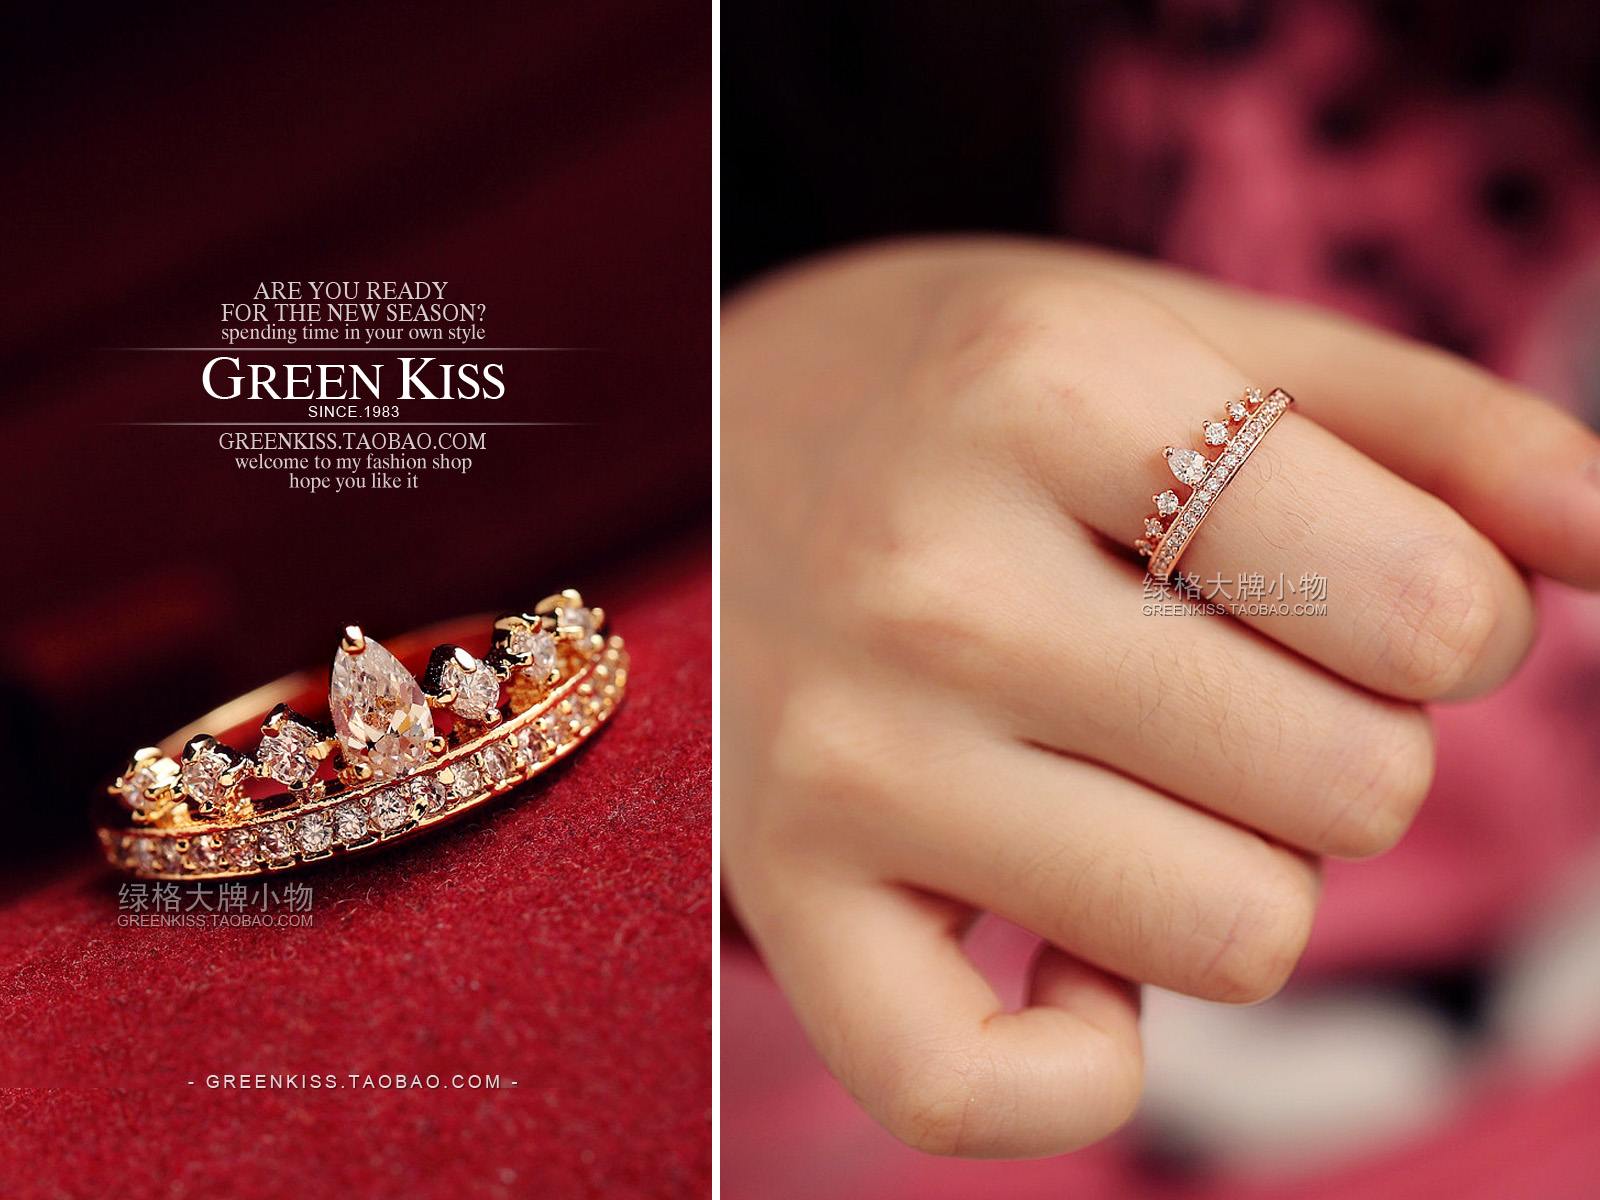 L-J1 Корейский мода ретро барокко красивых Flash бриллиант короны женского стерео кольца кольца